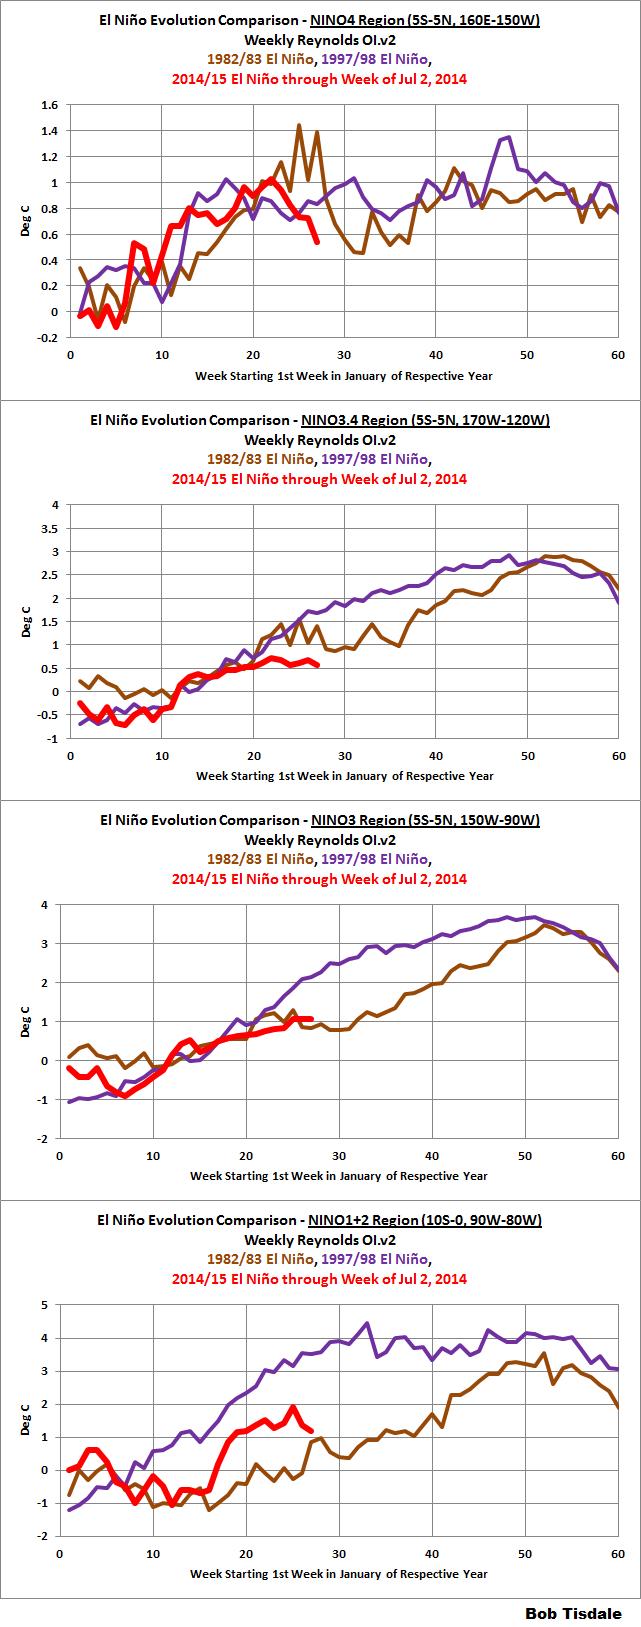 02 NINO Region Evolution Comparisons